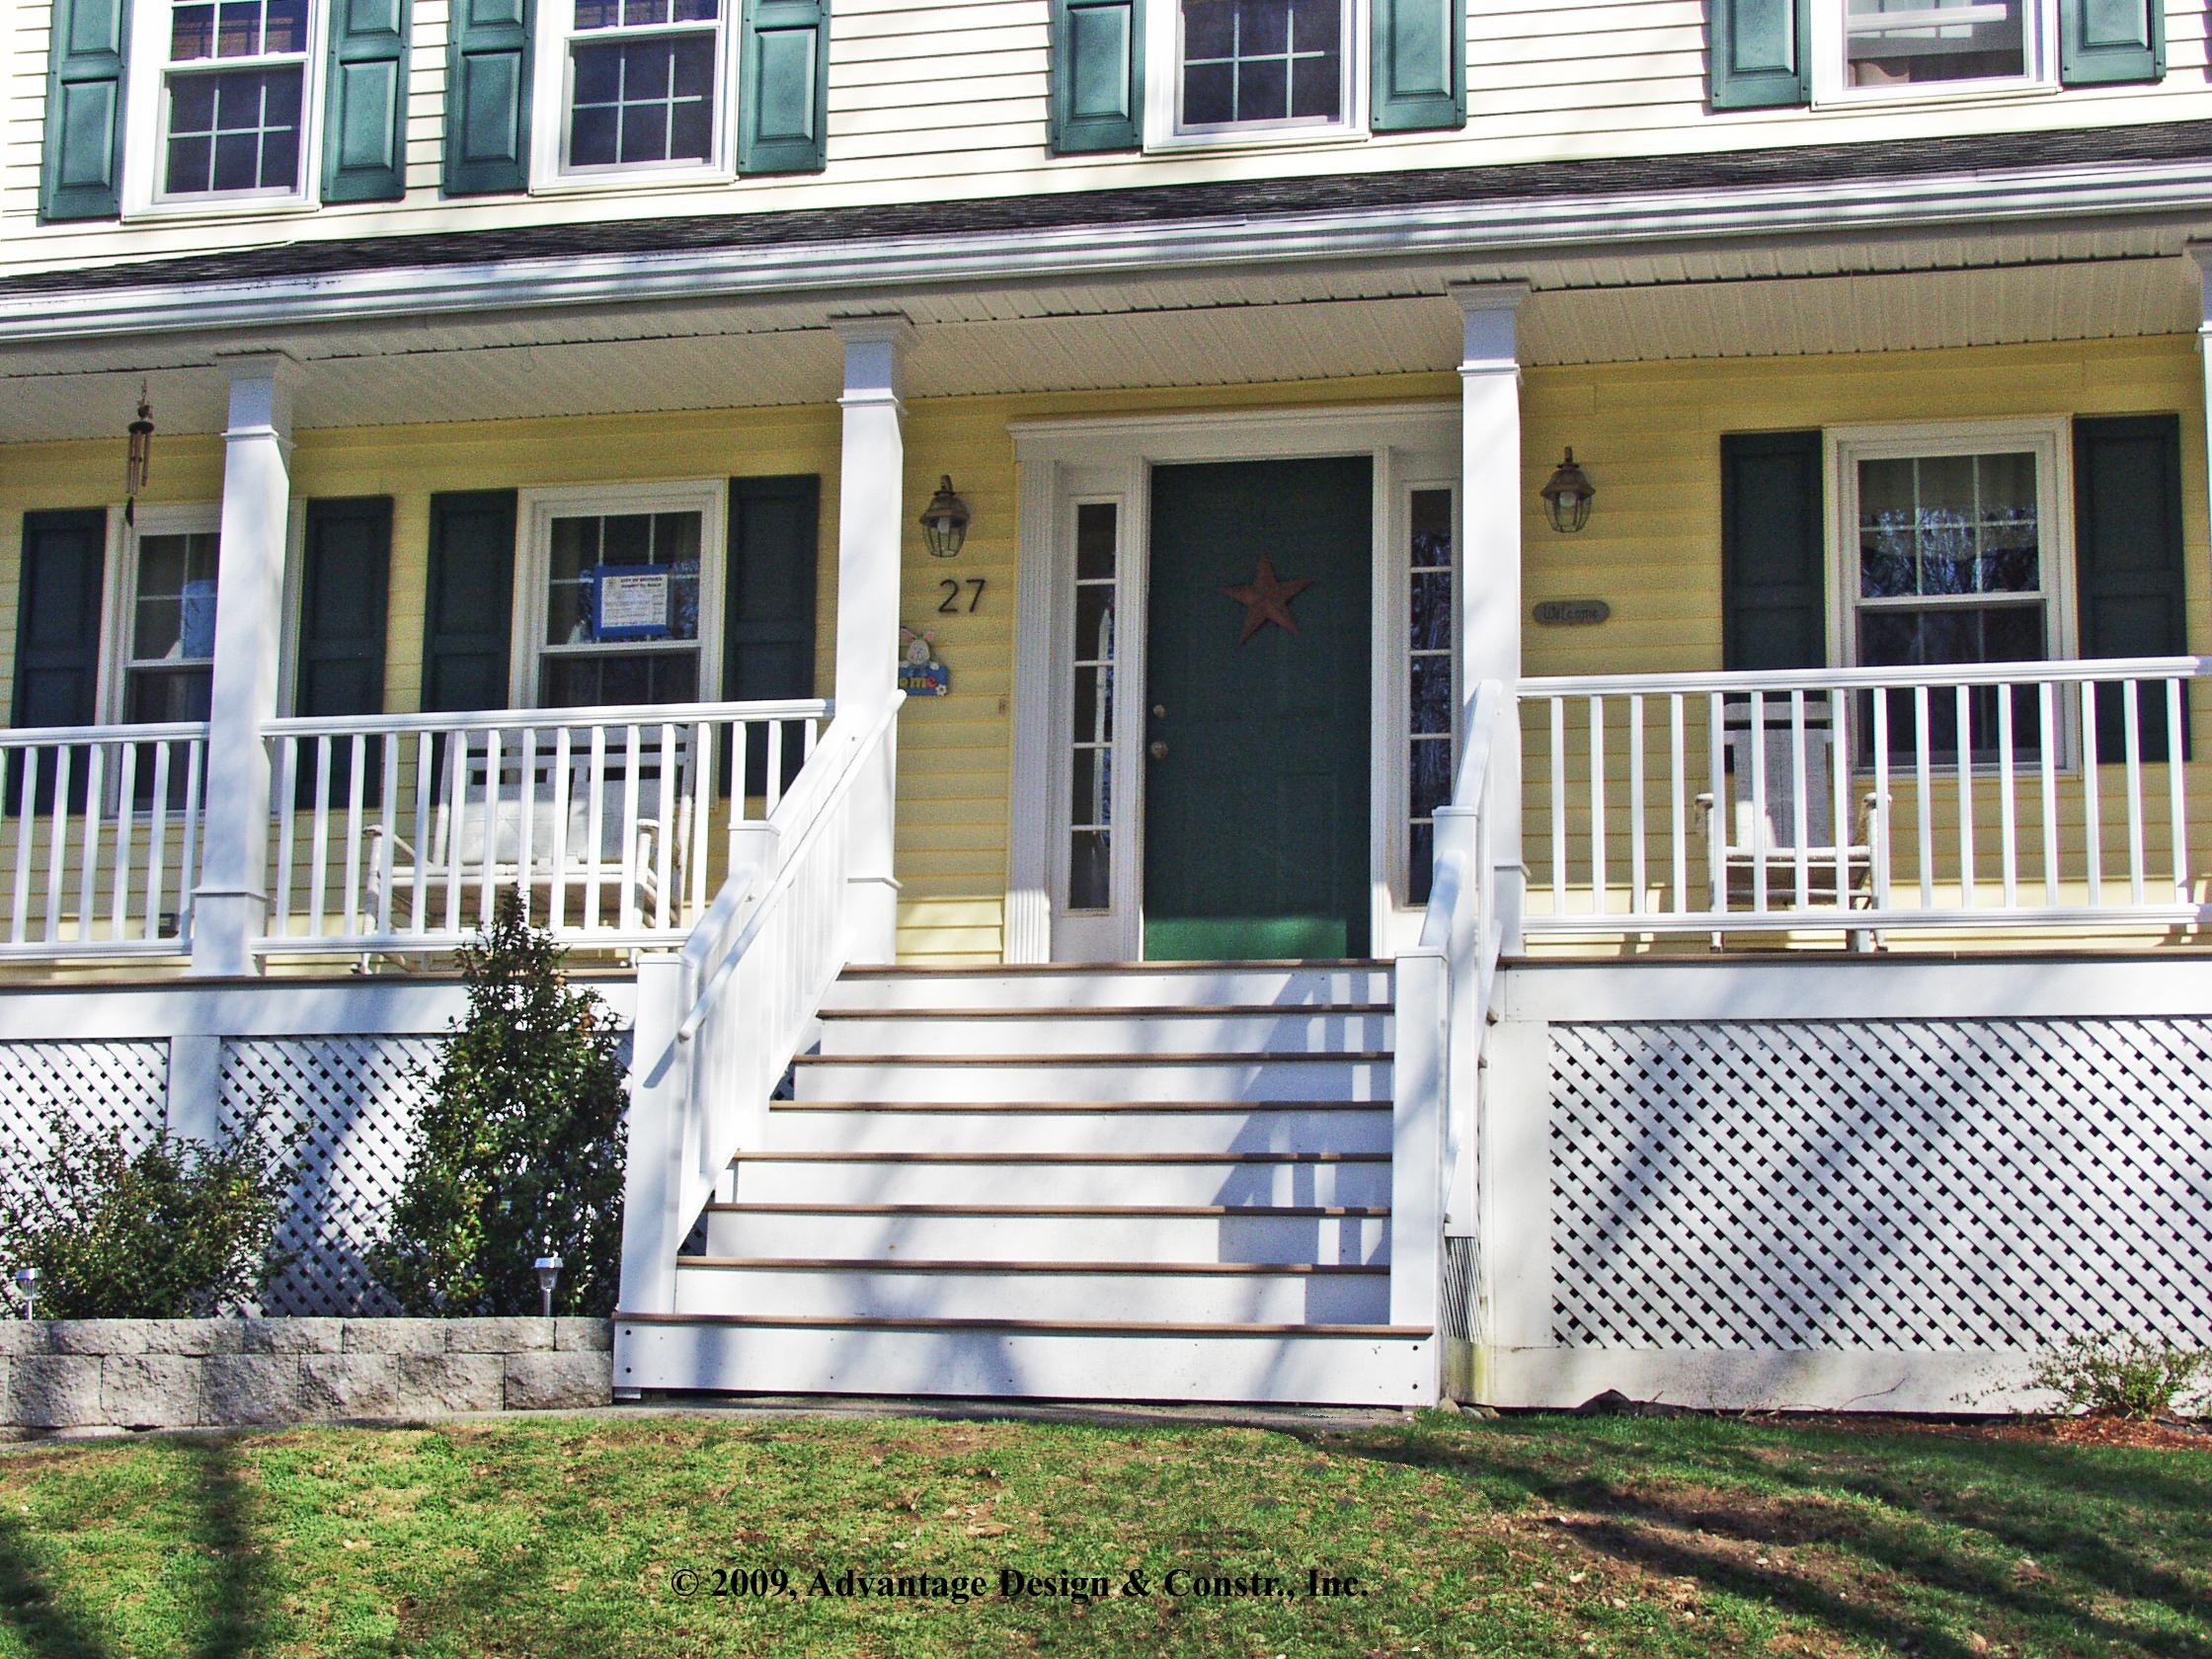 Front Porches A Pictoral Essay Suburban Boston Decks